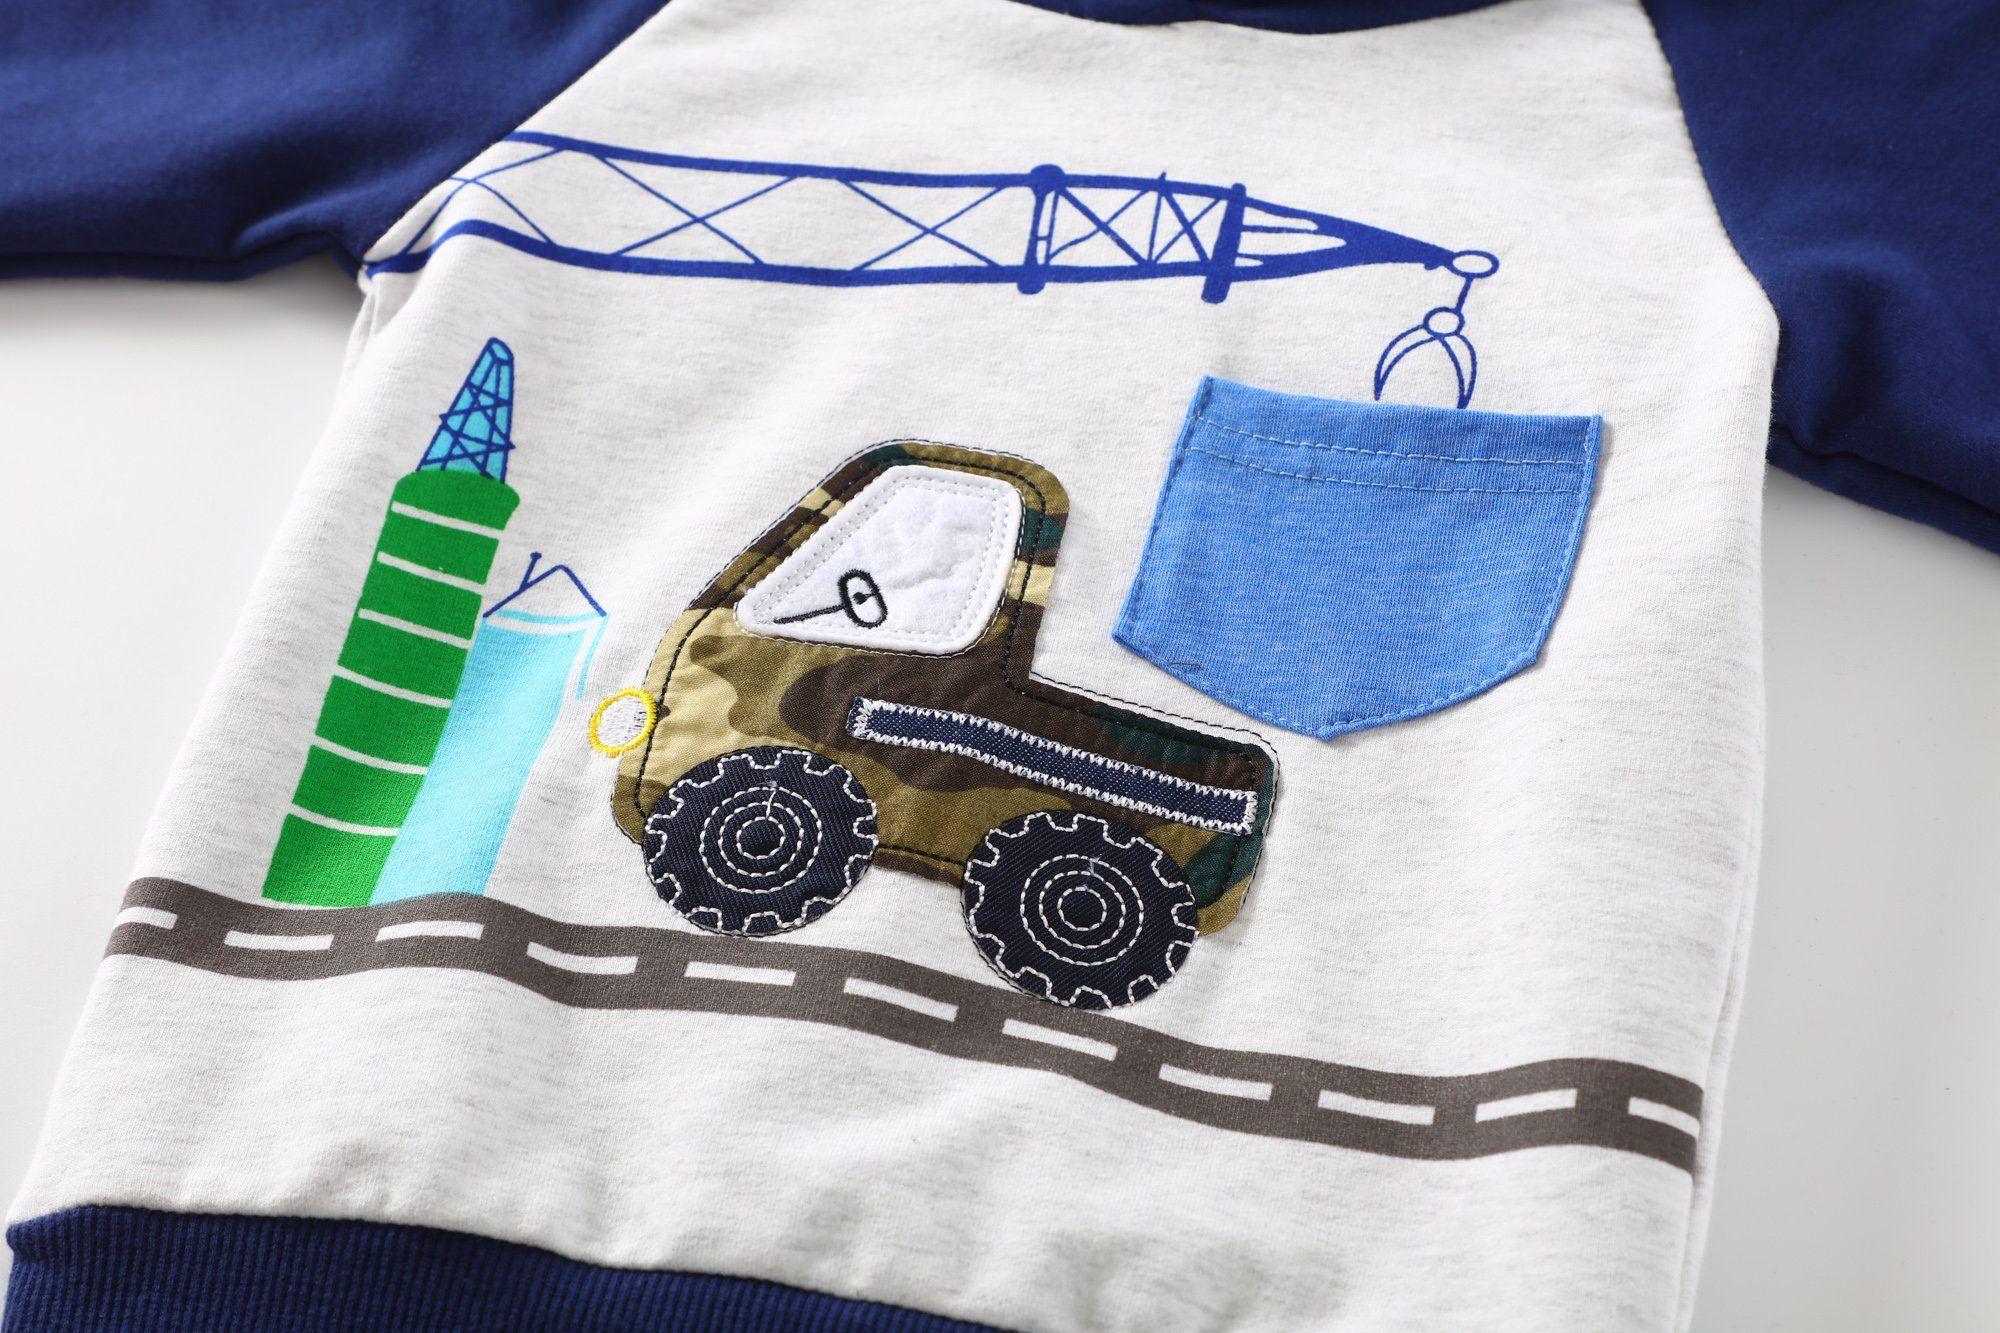 Baby Love Toddler Boys Clothes Outfit Truck Applique Hoodie Denim Jeans 2PCS Set